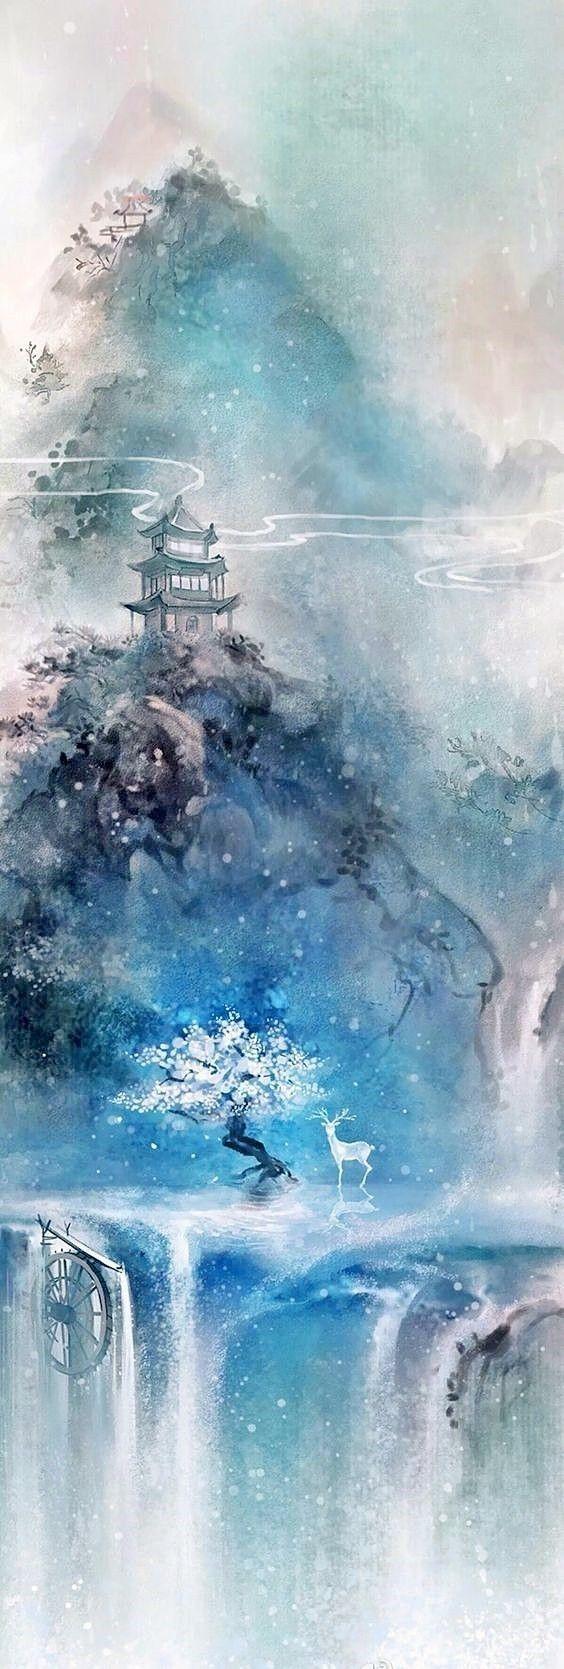 Pin By Liaison On Hoa Chi Truyện Fantasy Landscape Landscape Art Anime Scenery